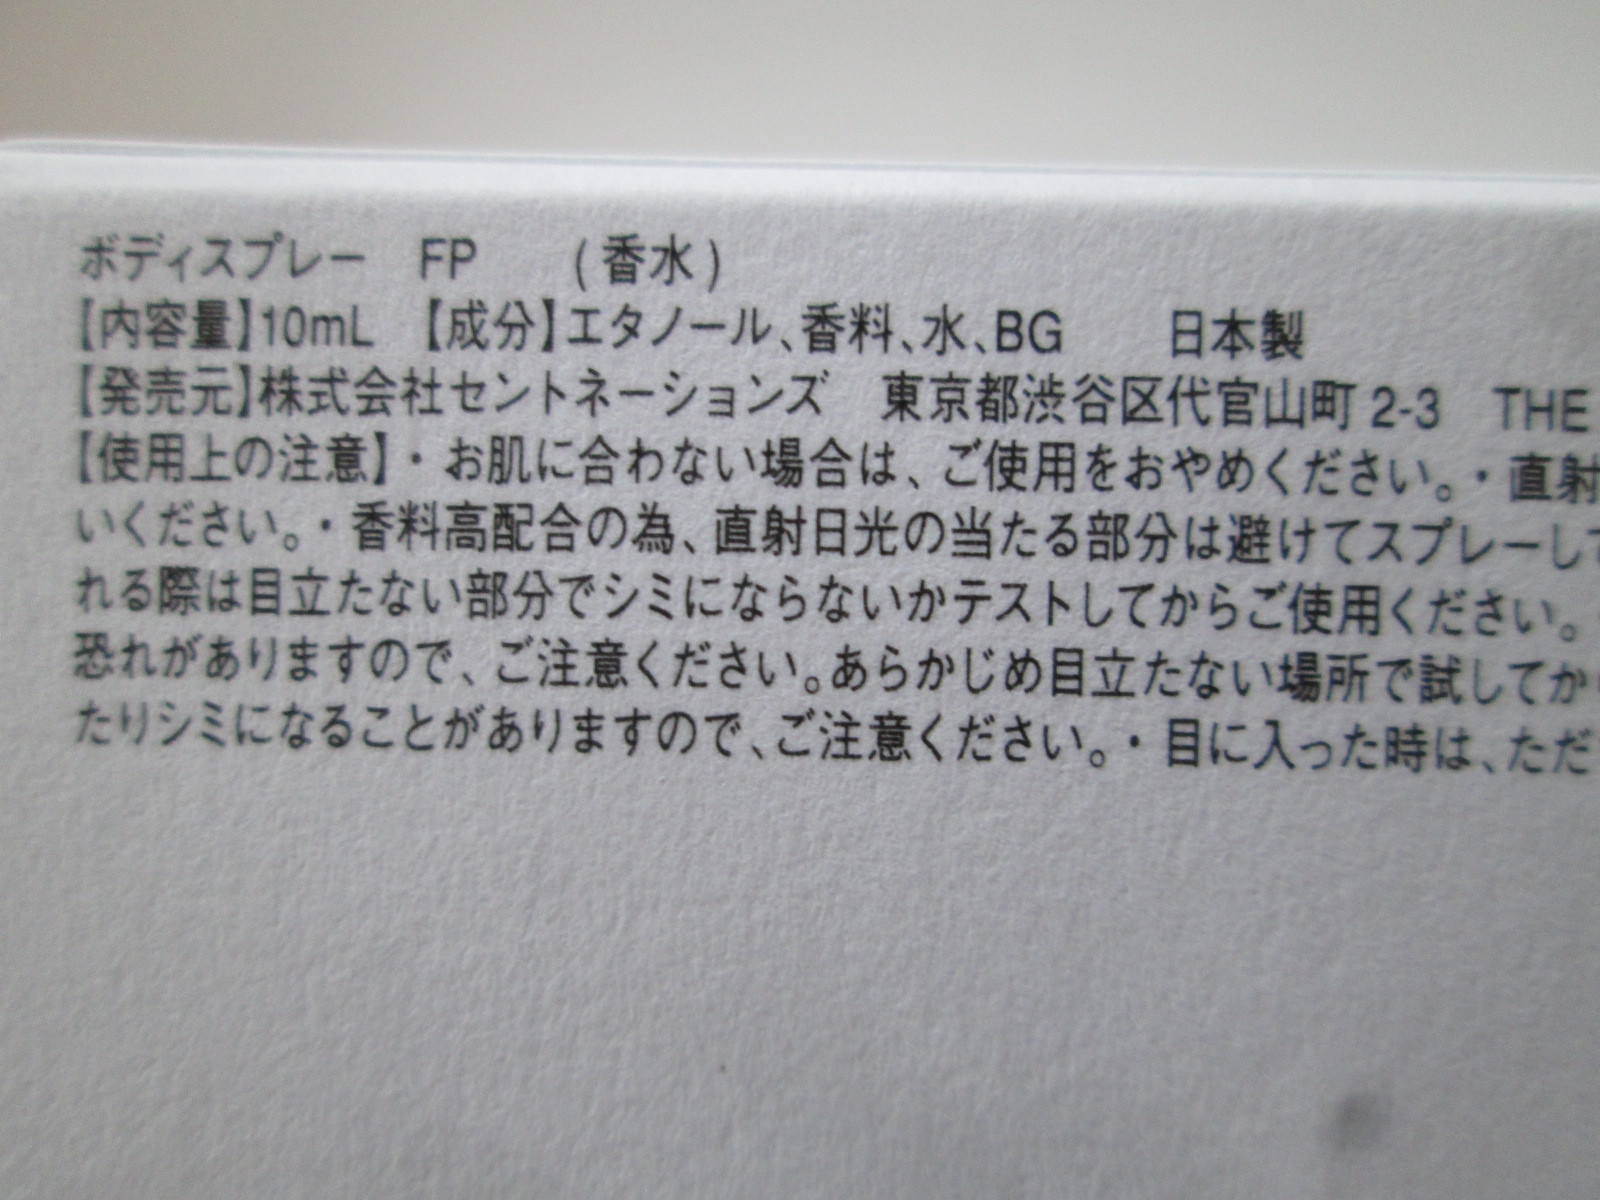 IMG_7723レイヤ (2)